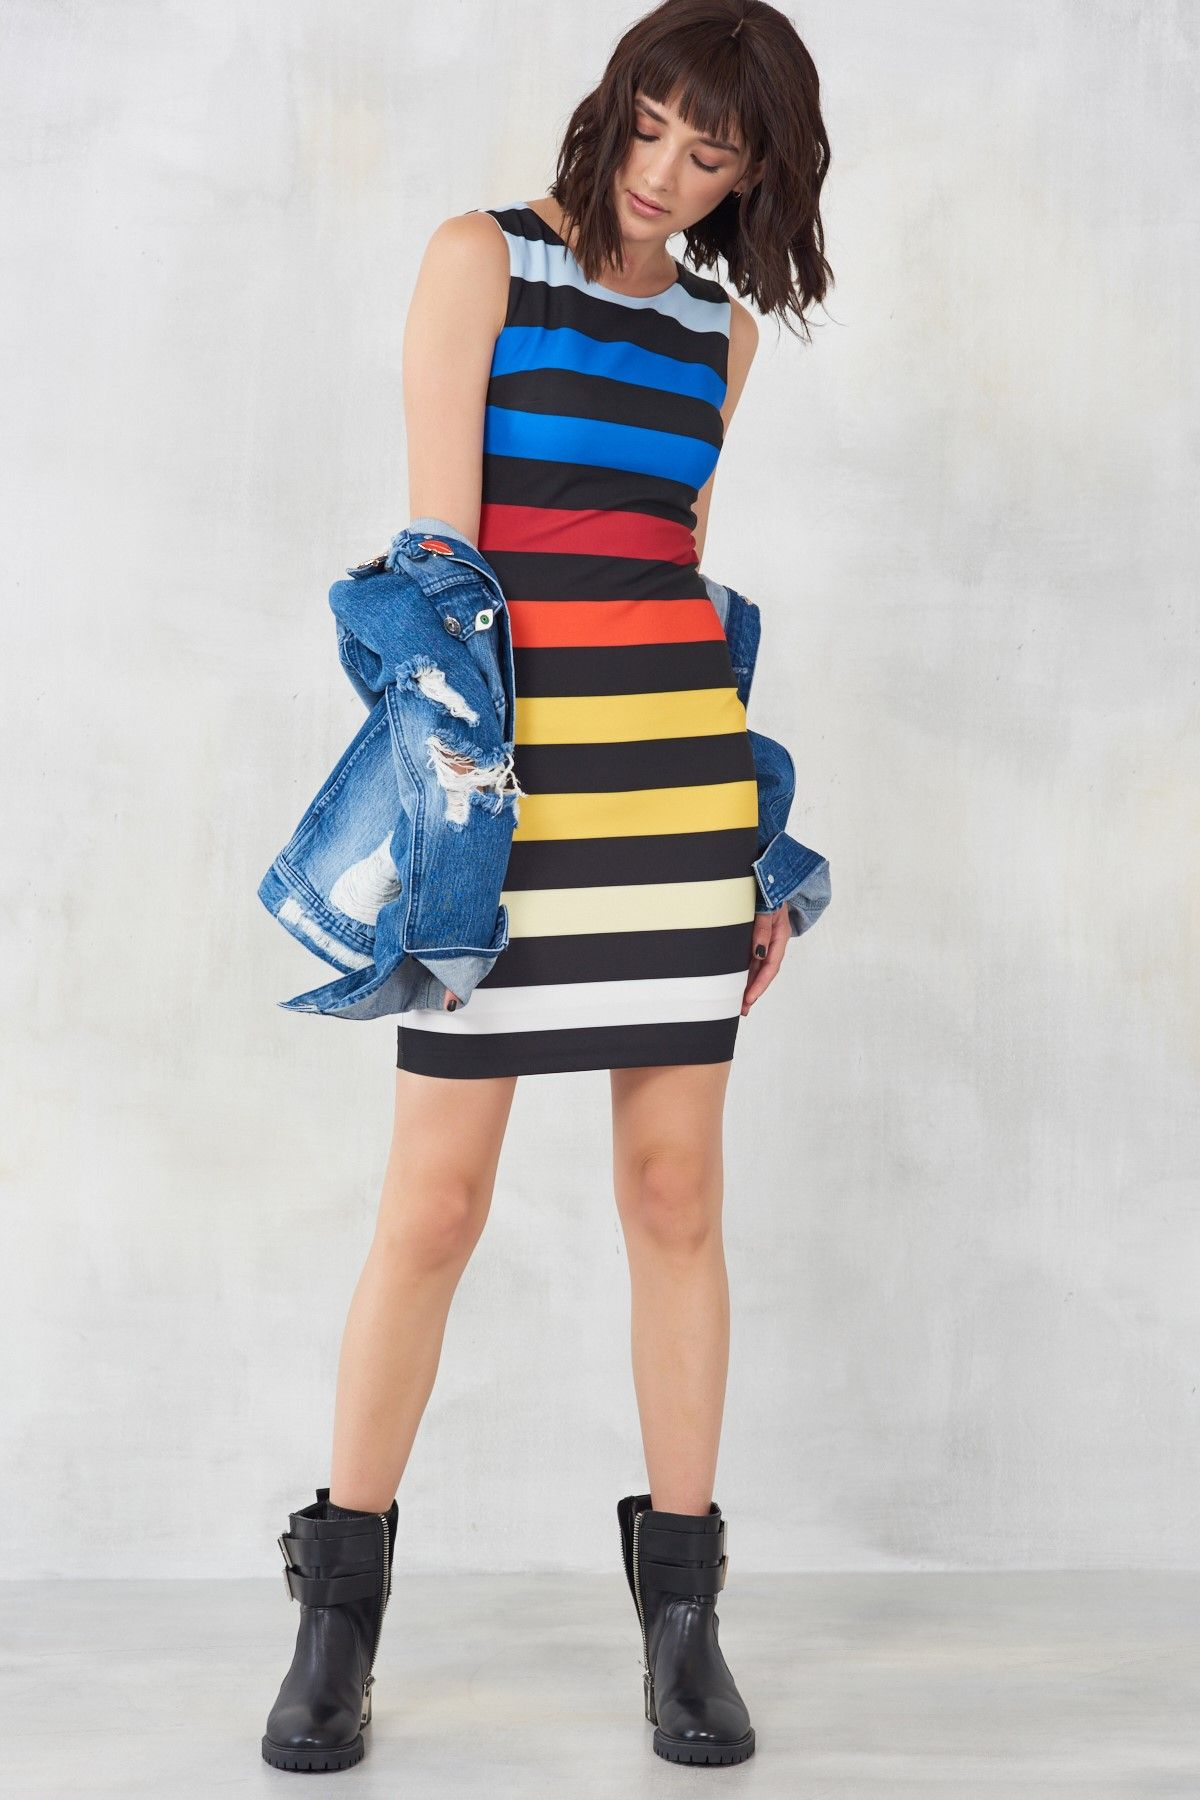 Renkli Cizgili Elbise Trendyolmilla Trendyol Cizgili Elbise Elbise Trendler